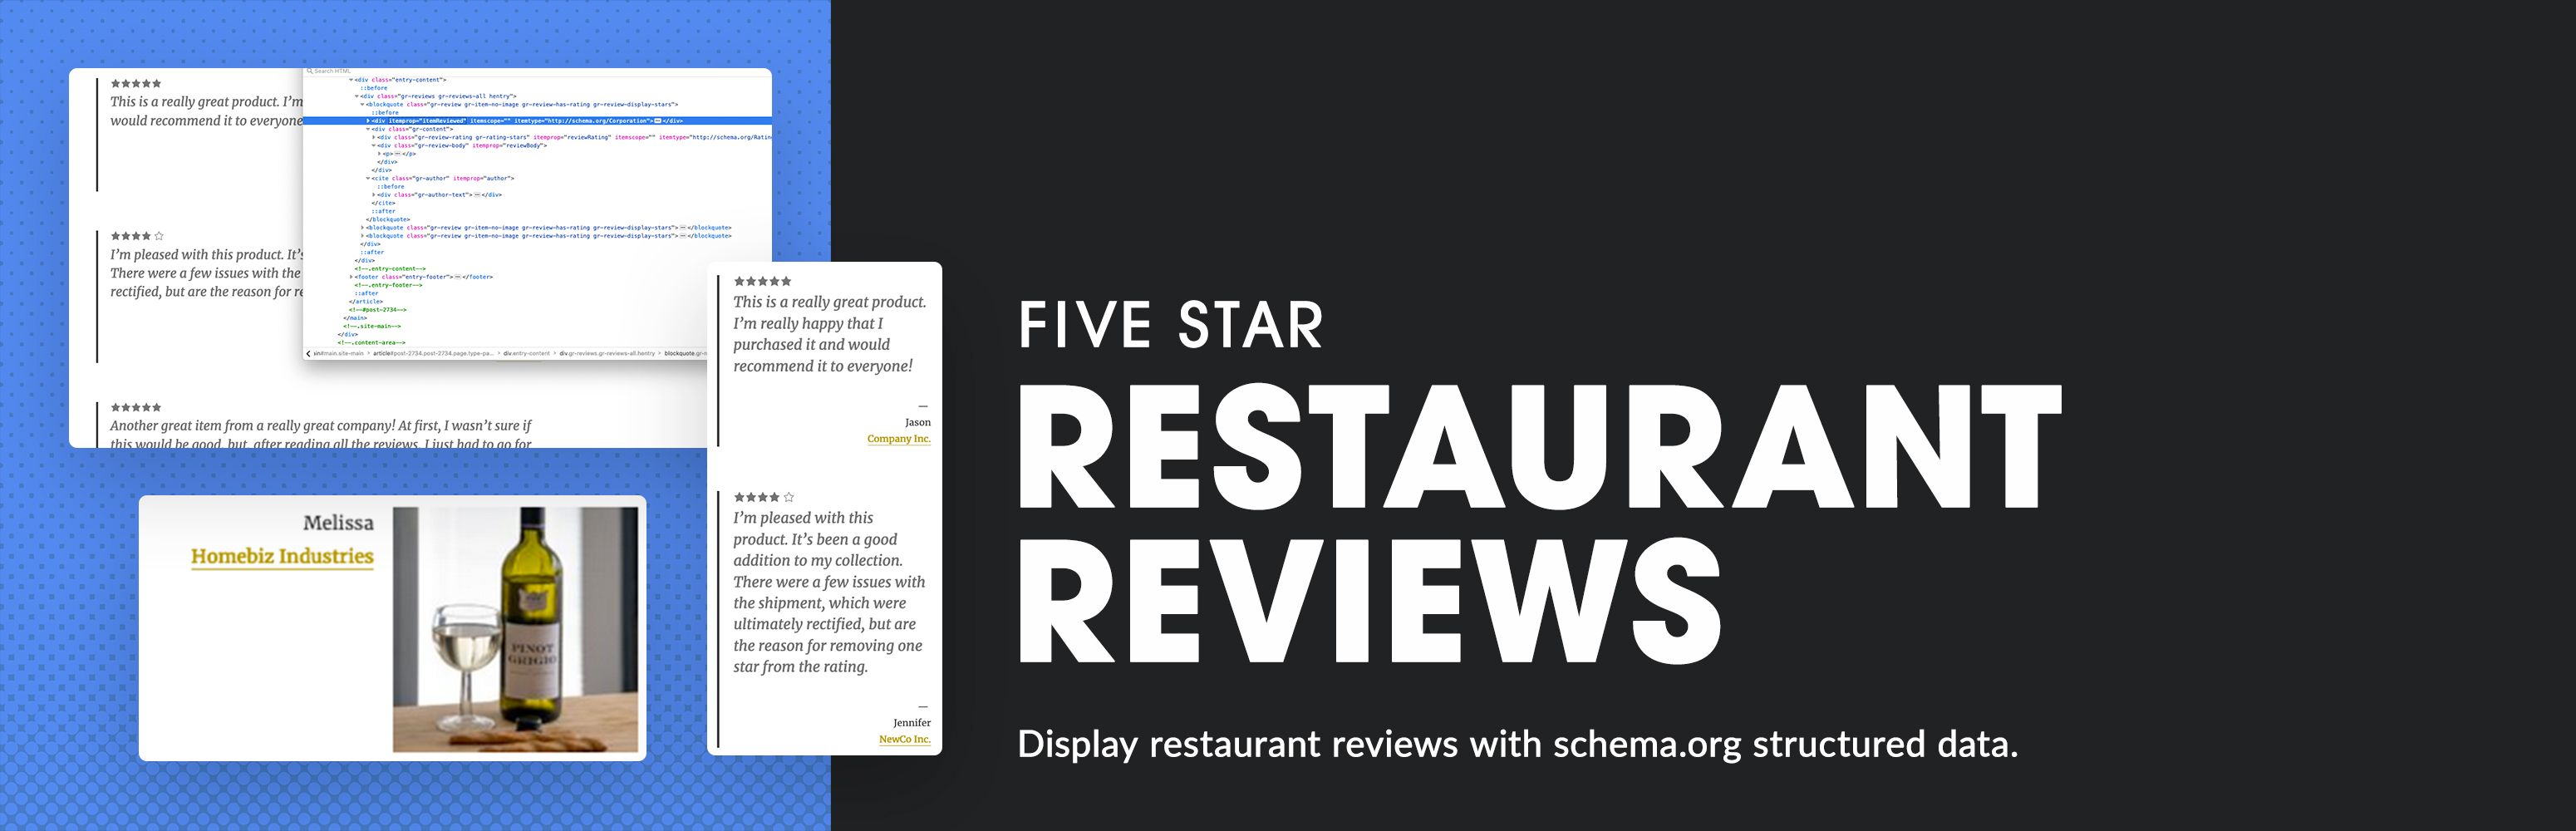 Five Star Restaurant Reviews